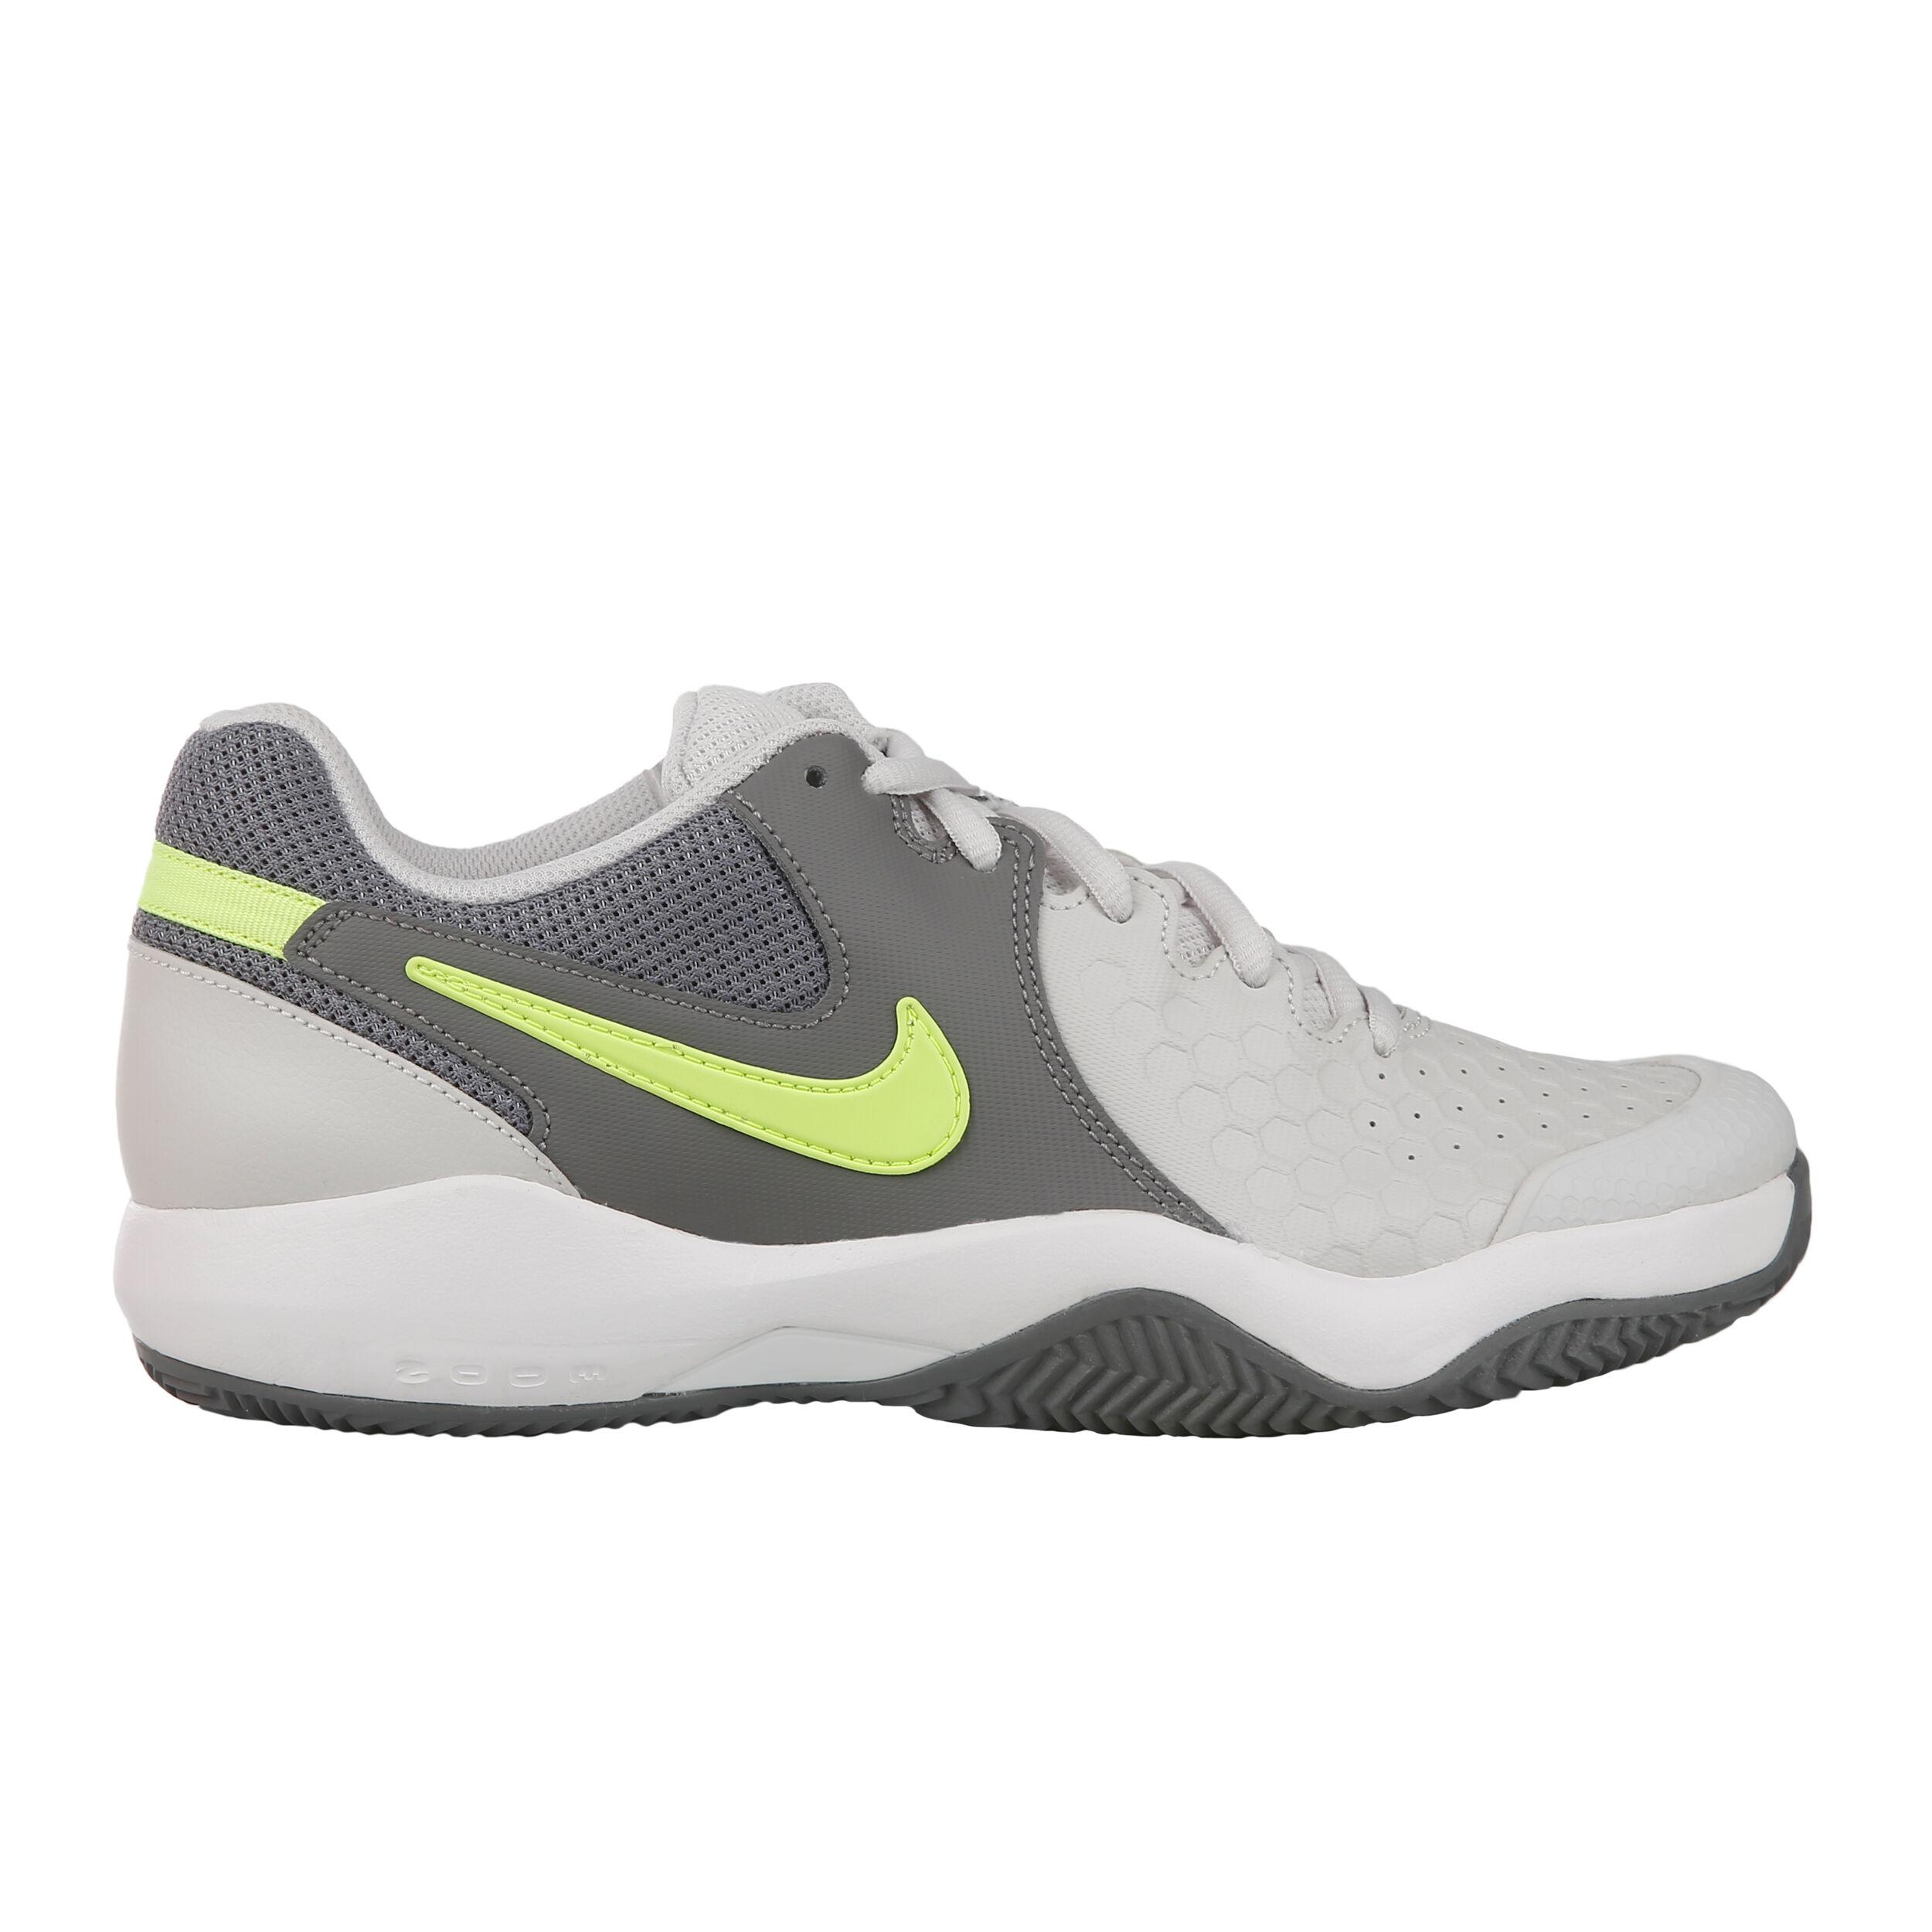 Nike Air Zoom Resistance Clay Sko För Grus Damer Ljusgrå, Neongul